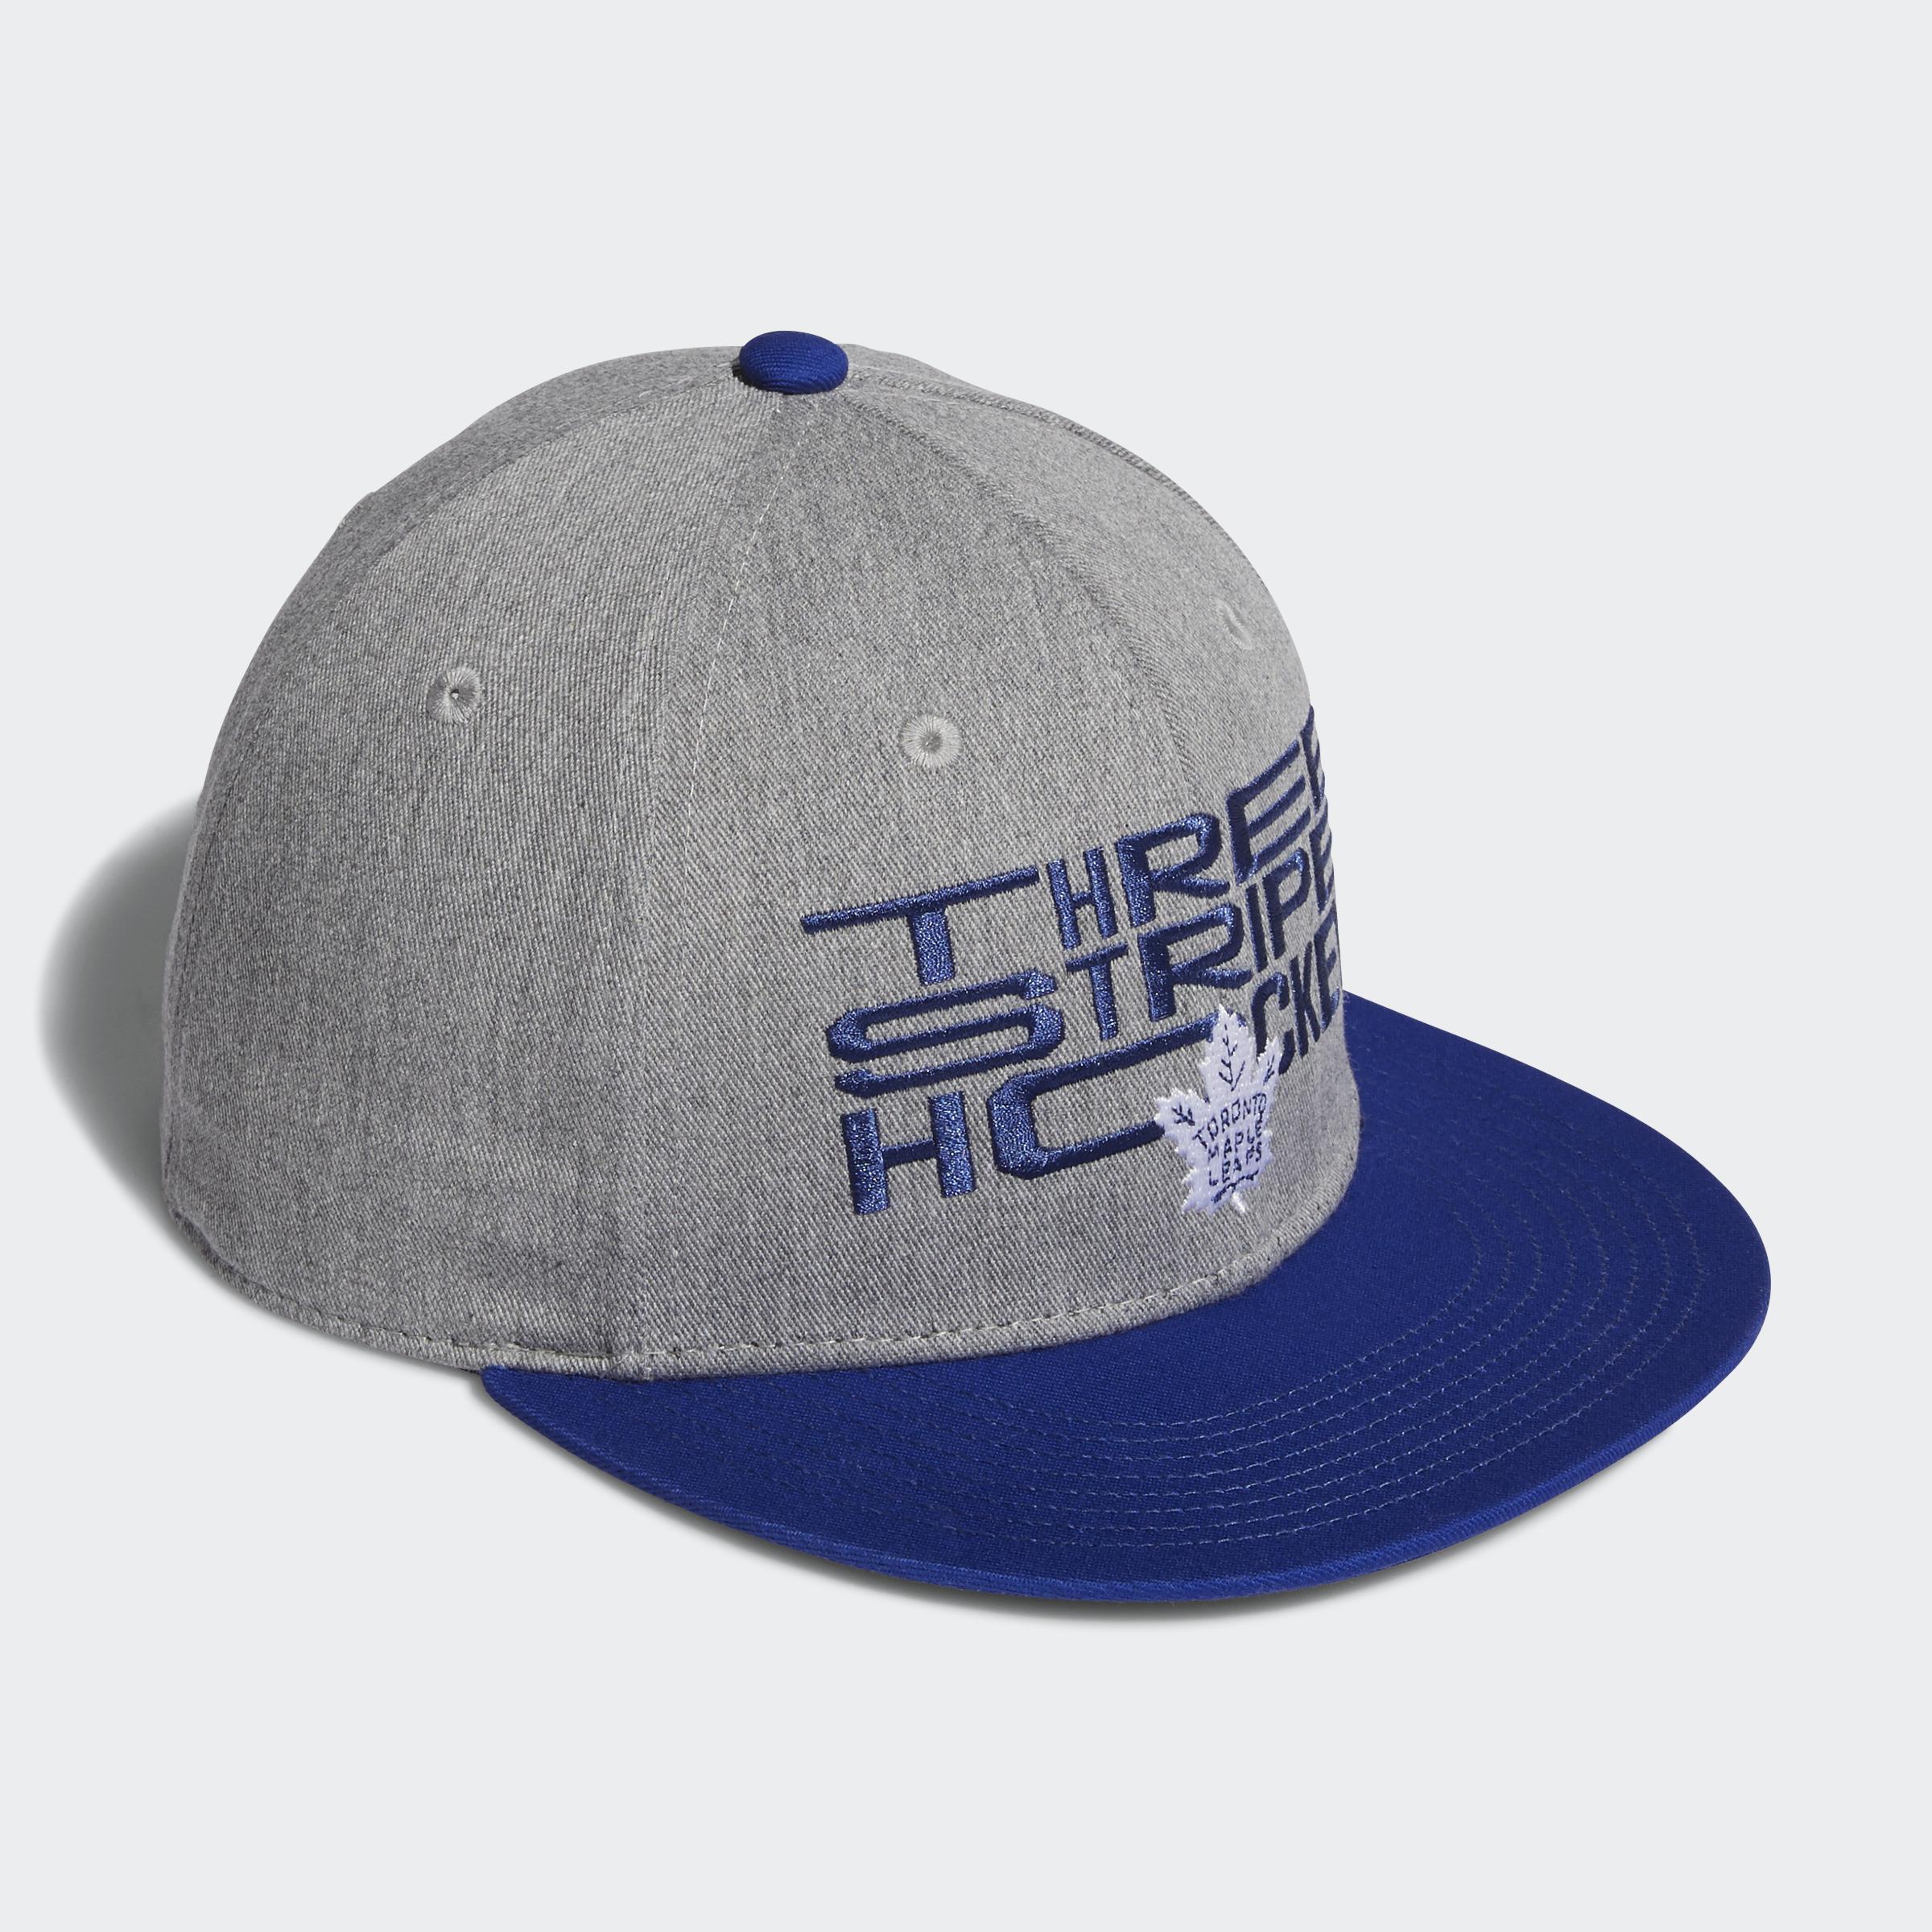 adidas-Vancouver-Canucks-Three-Stripe-Hockey-Snapback-Cap-Men-039-s-Hats thumbnail 13